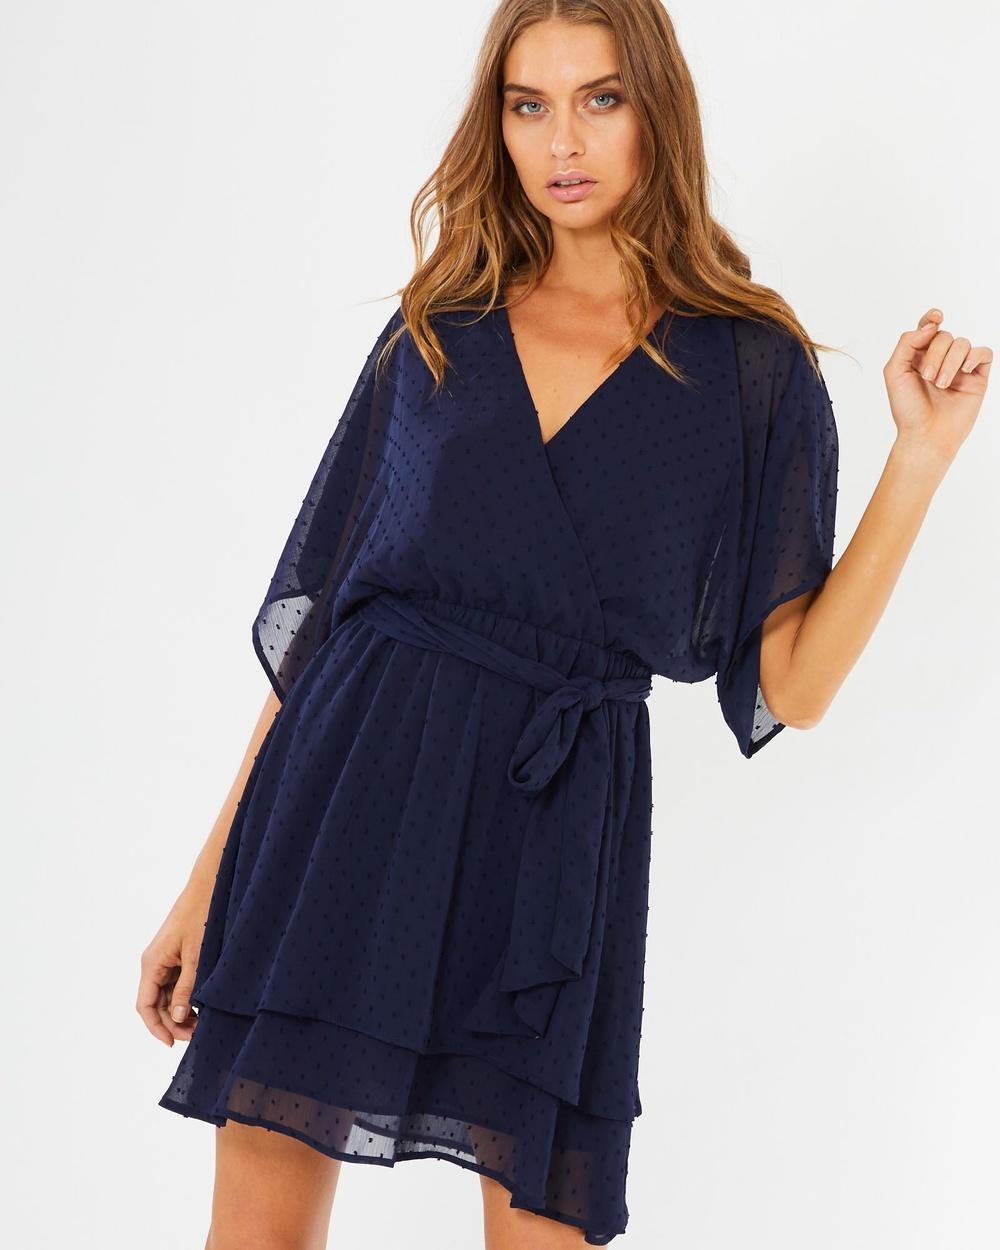 Tussah Burbank Dress Dresses Navy Speckle Spot Burbank Dress